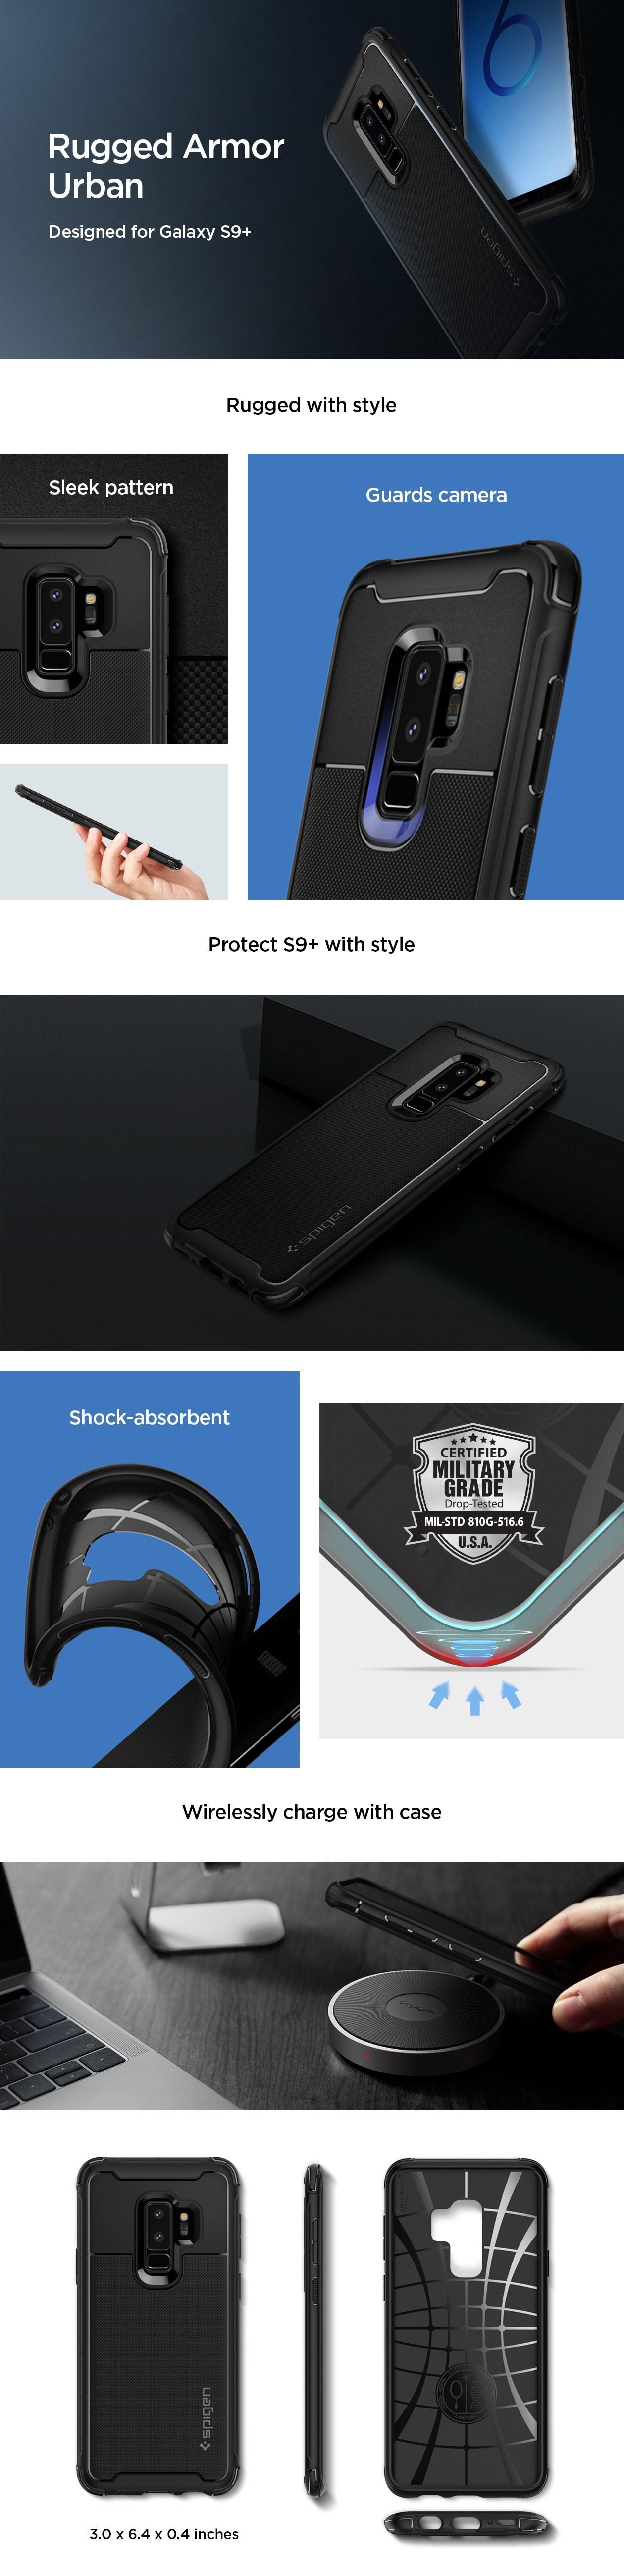 SPIGEN - Samsung Galaxy S9 Plus Case Rugged Armor Urban Black (593CS22962)